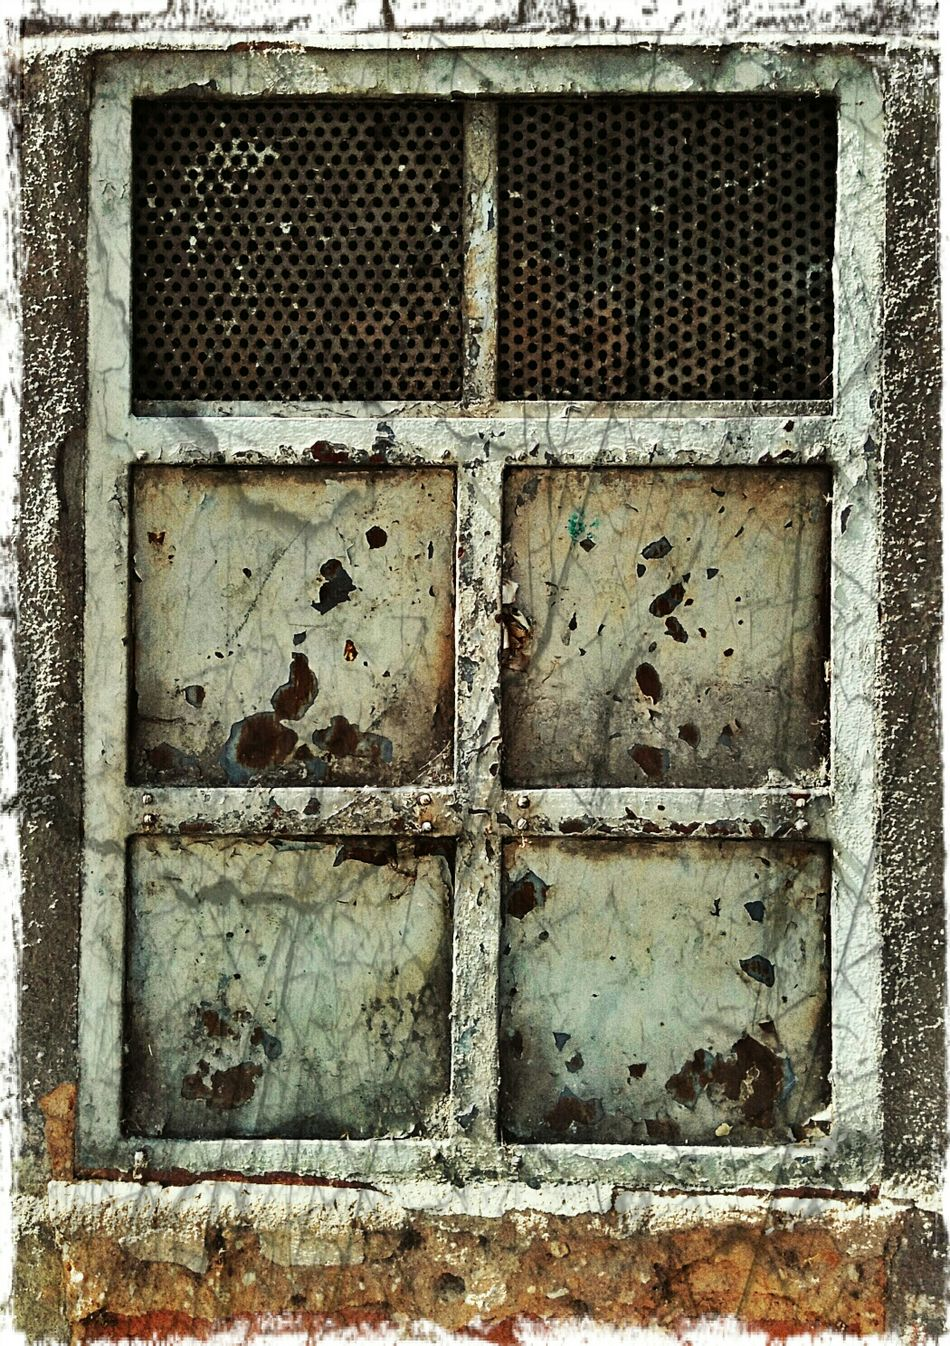 Artamo Windowsdoors